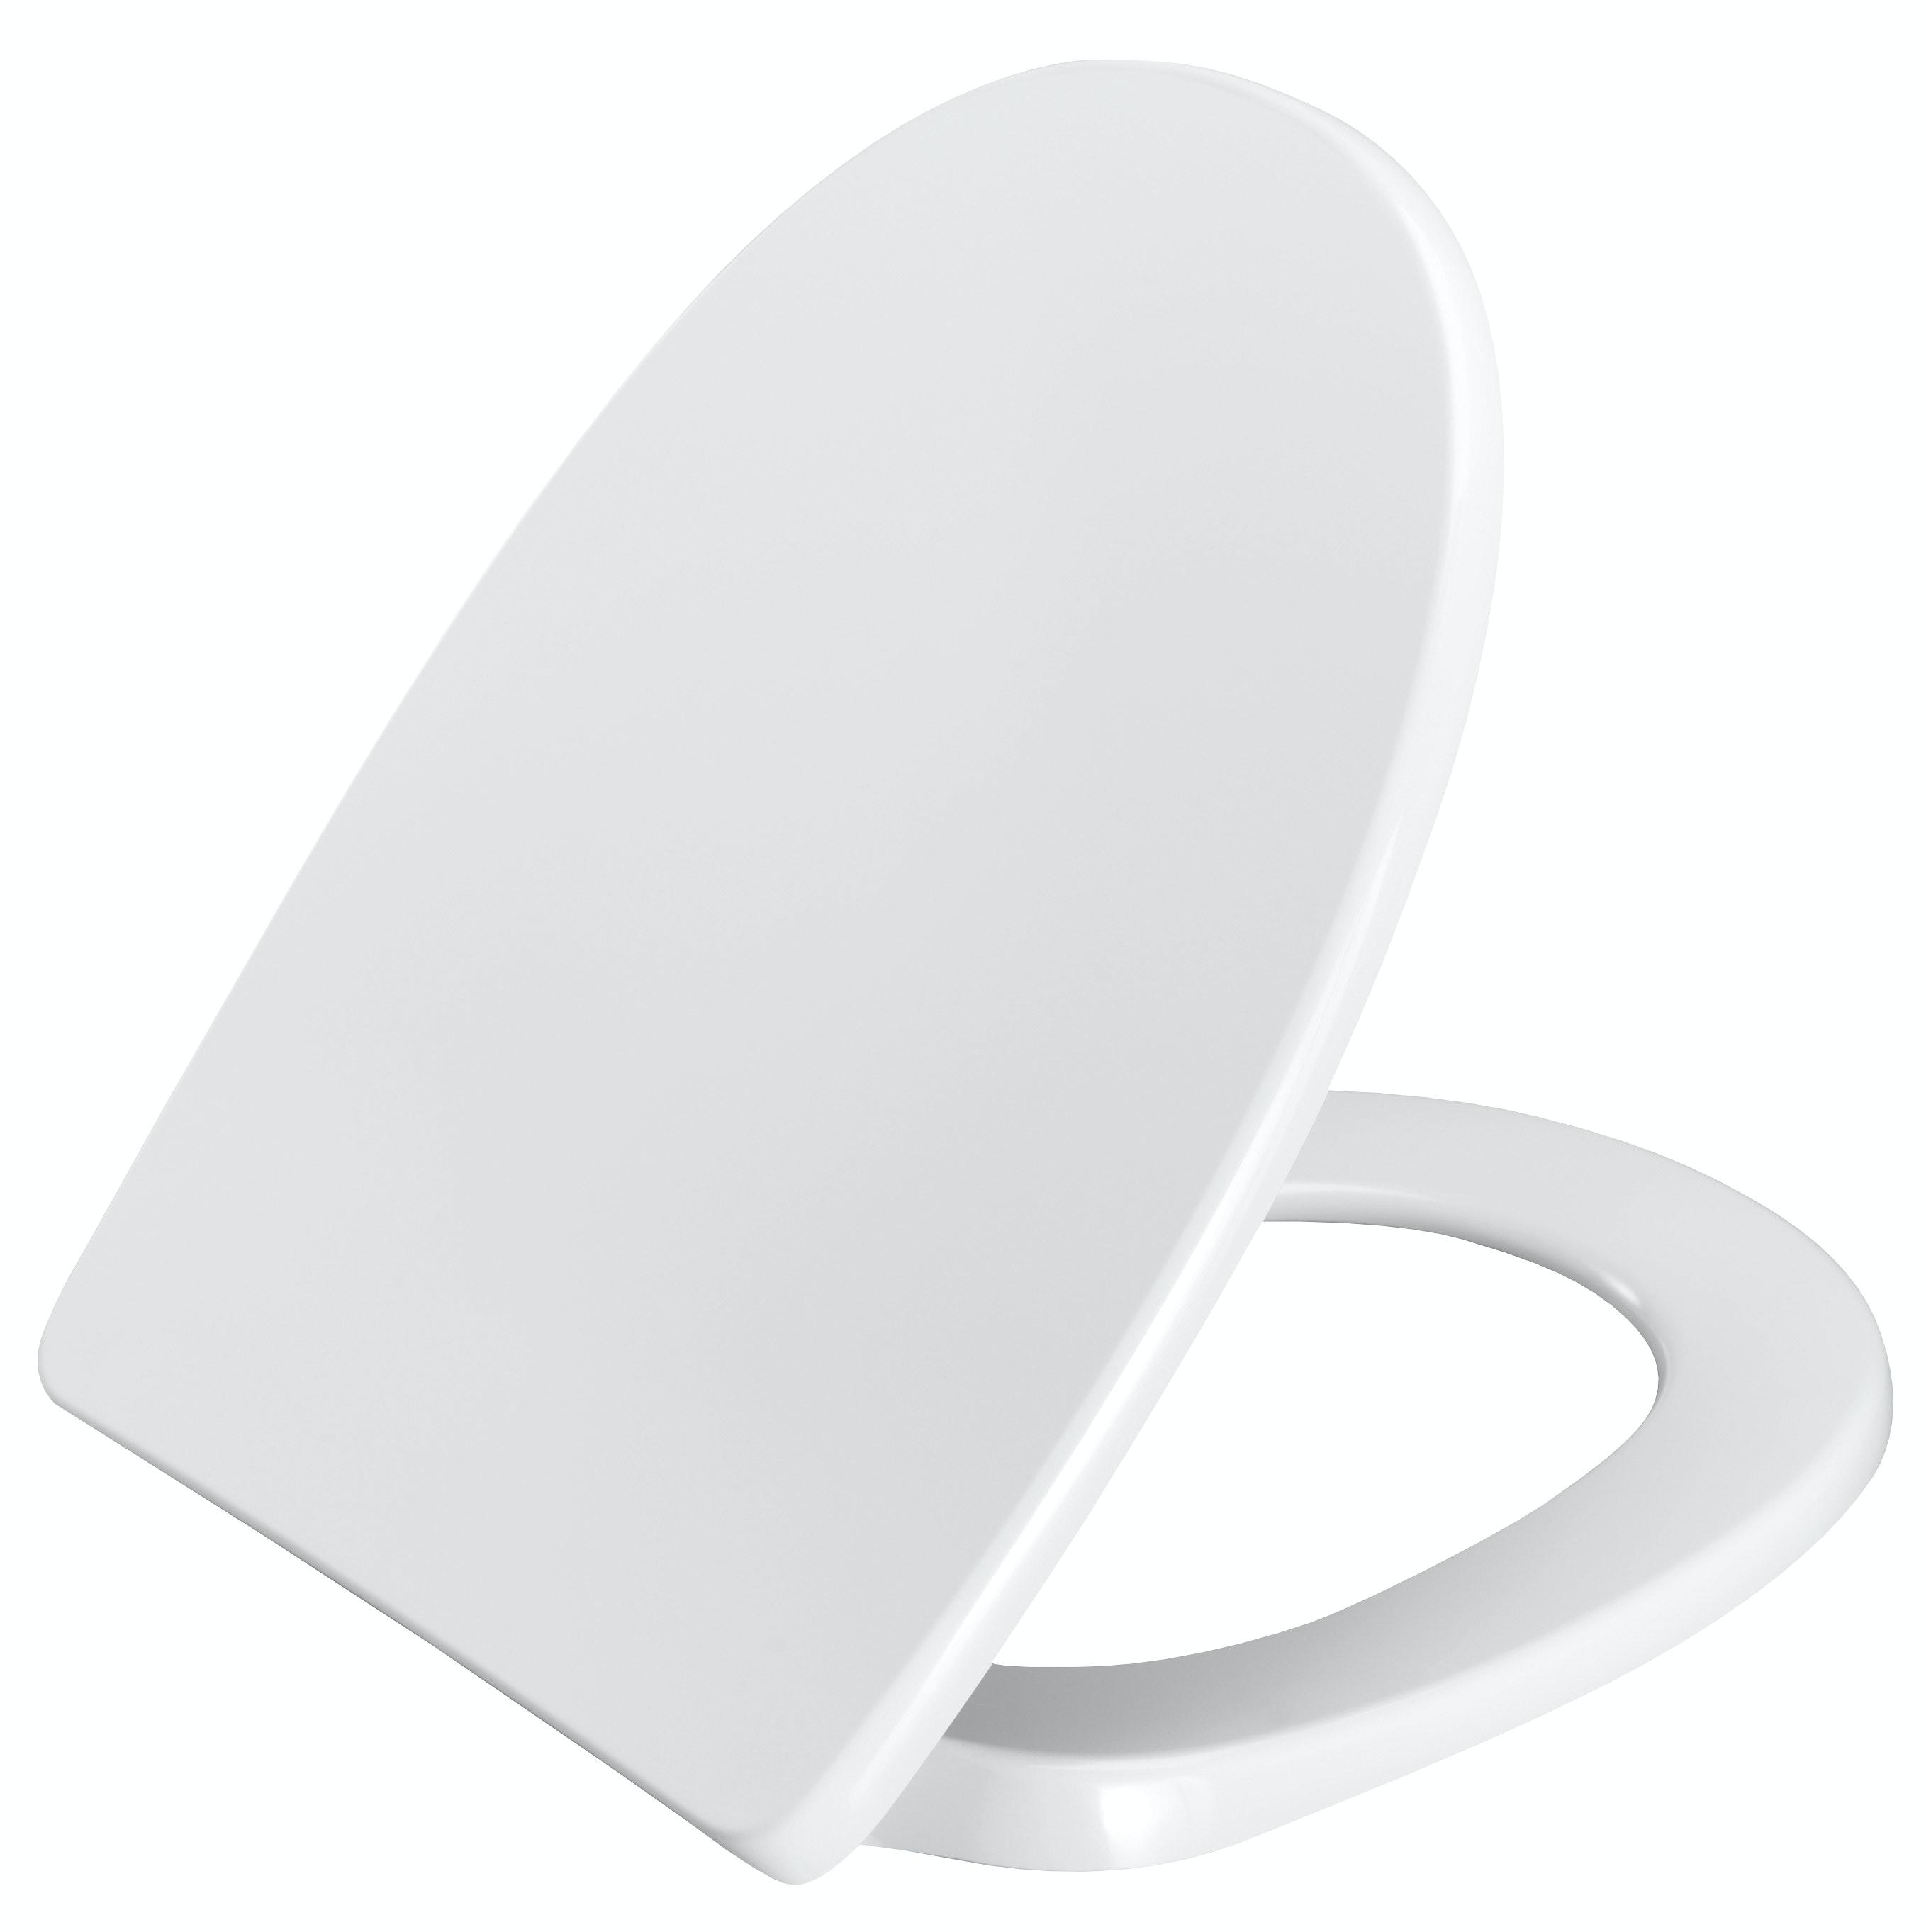 Toalettsits Saniscan Norden Soft Lift Off Vit